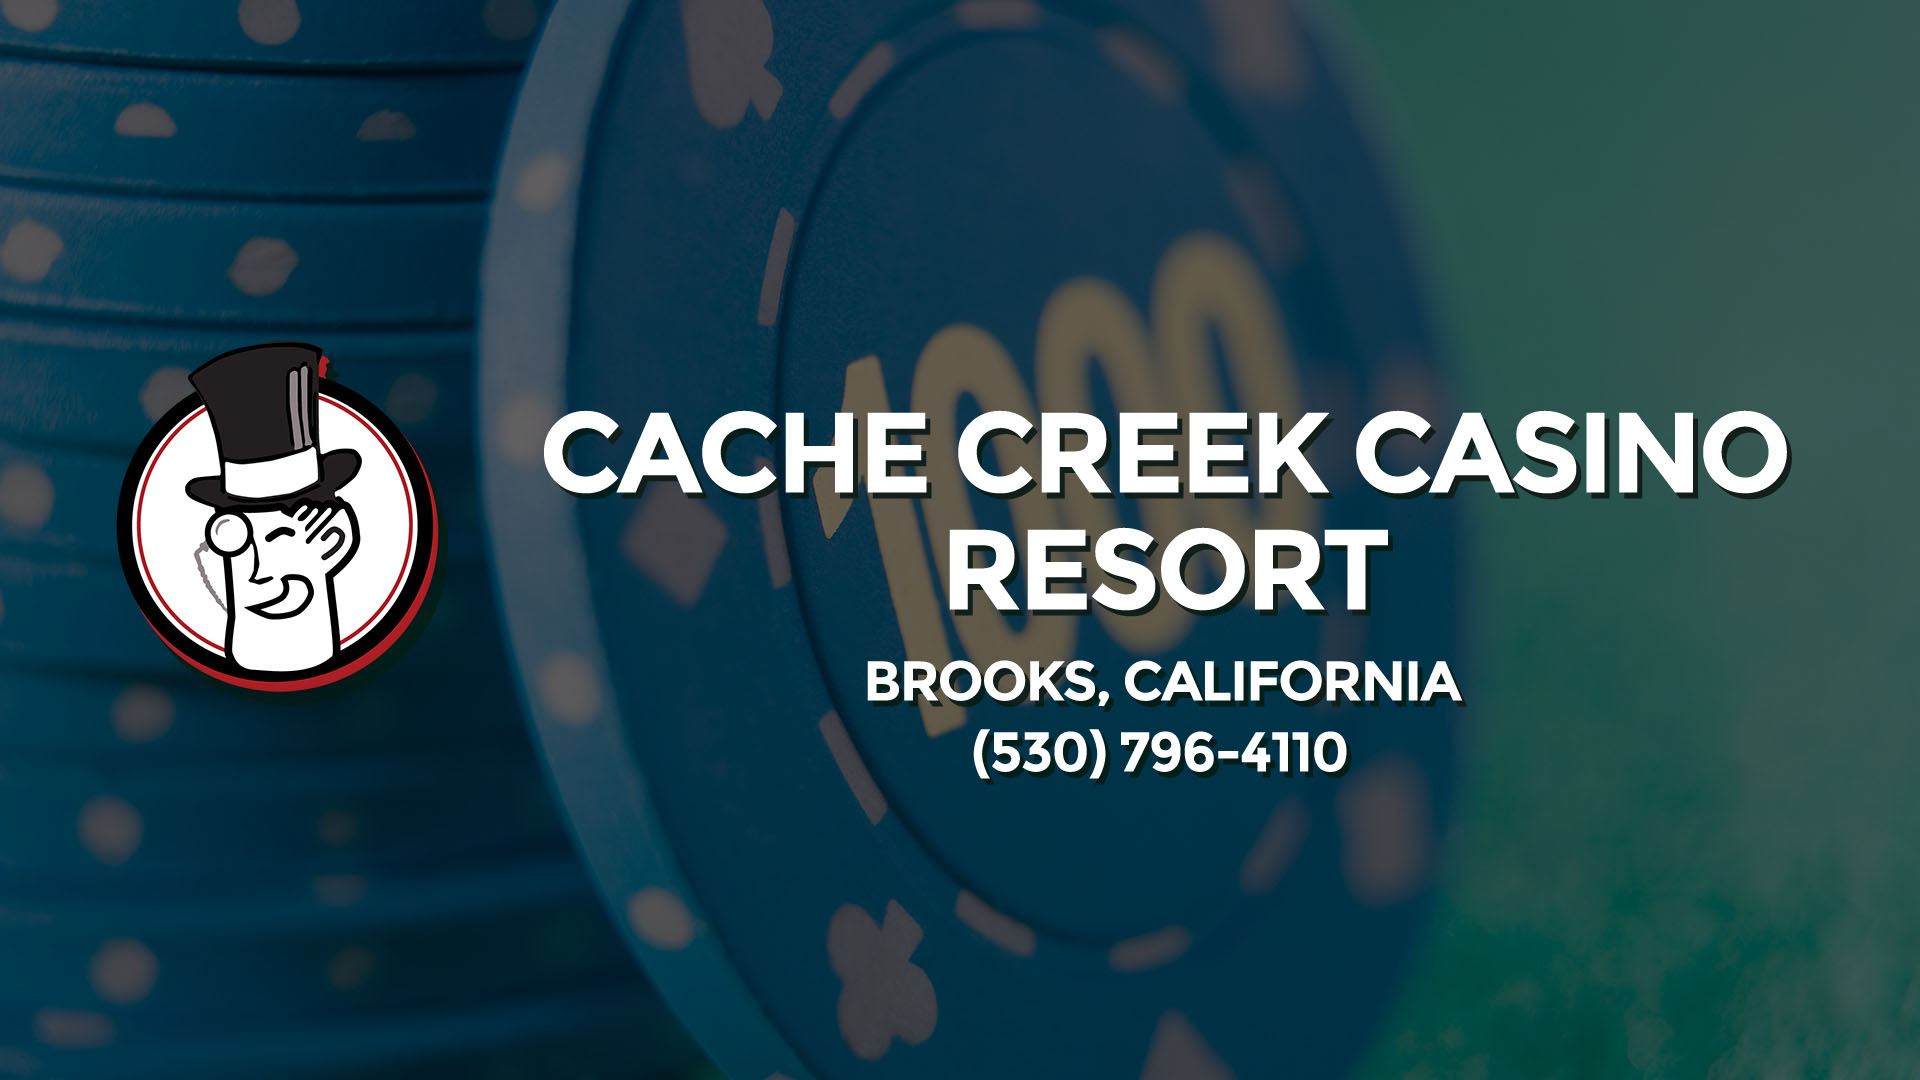 shuttle bus to cache creek casino